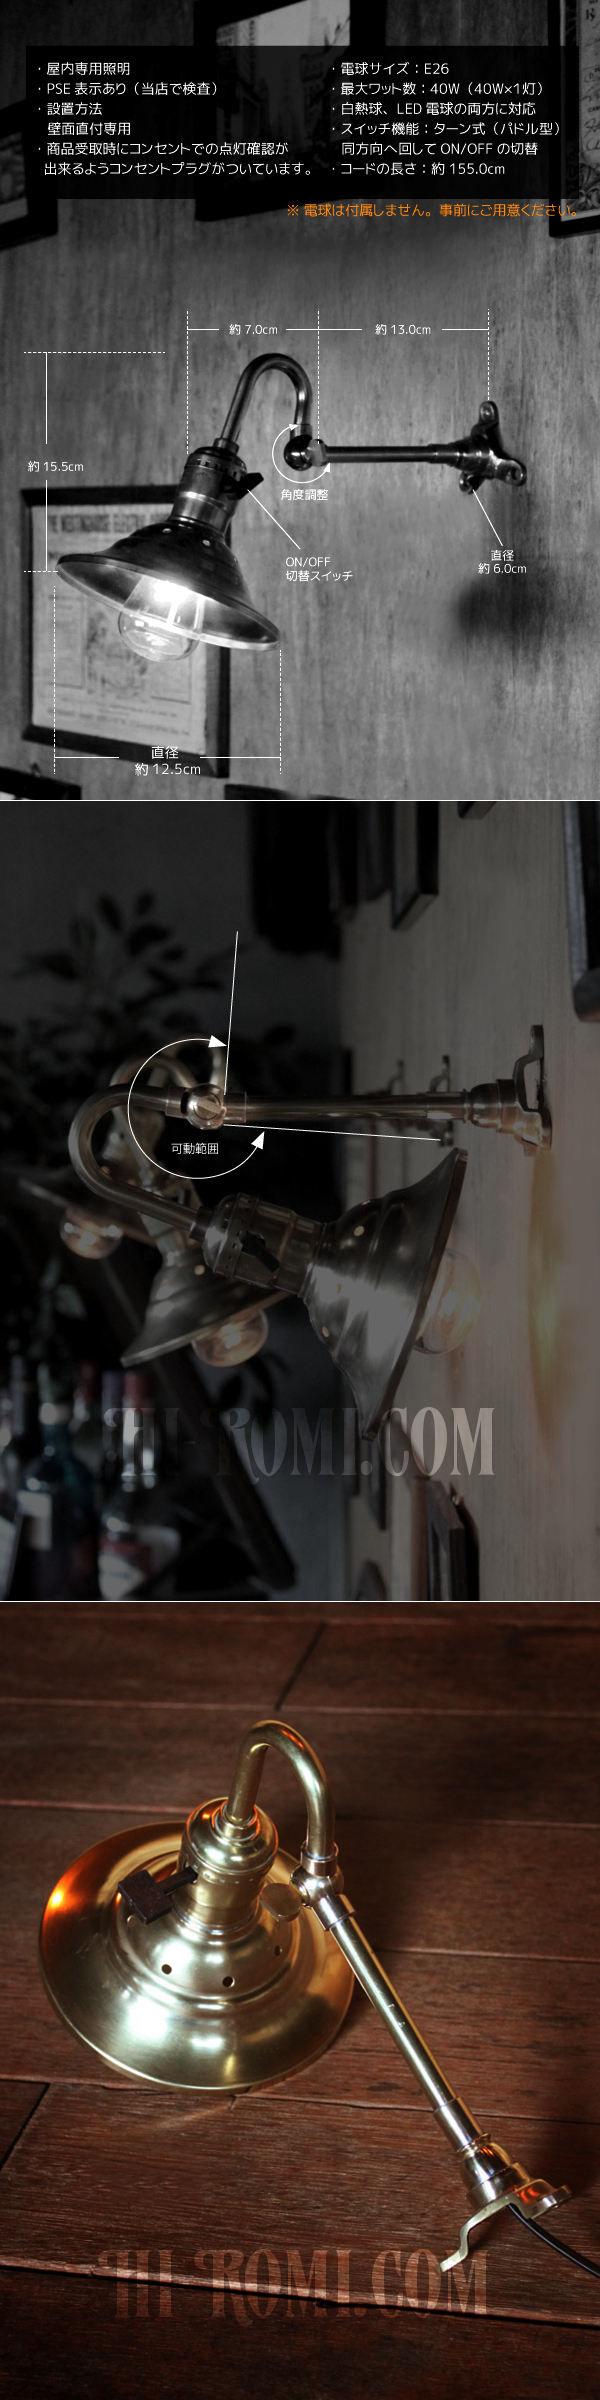 LEVITON社製パドルスイッチソケット&角度調整付ミニシェード真鍮製ブラケット/工業系壁面照明ウォールランプライト